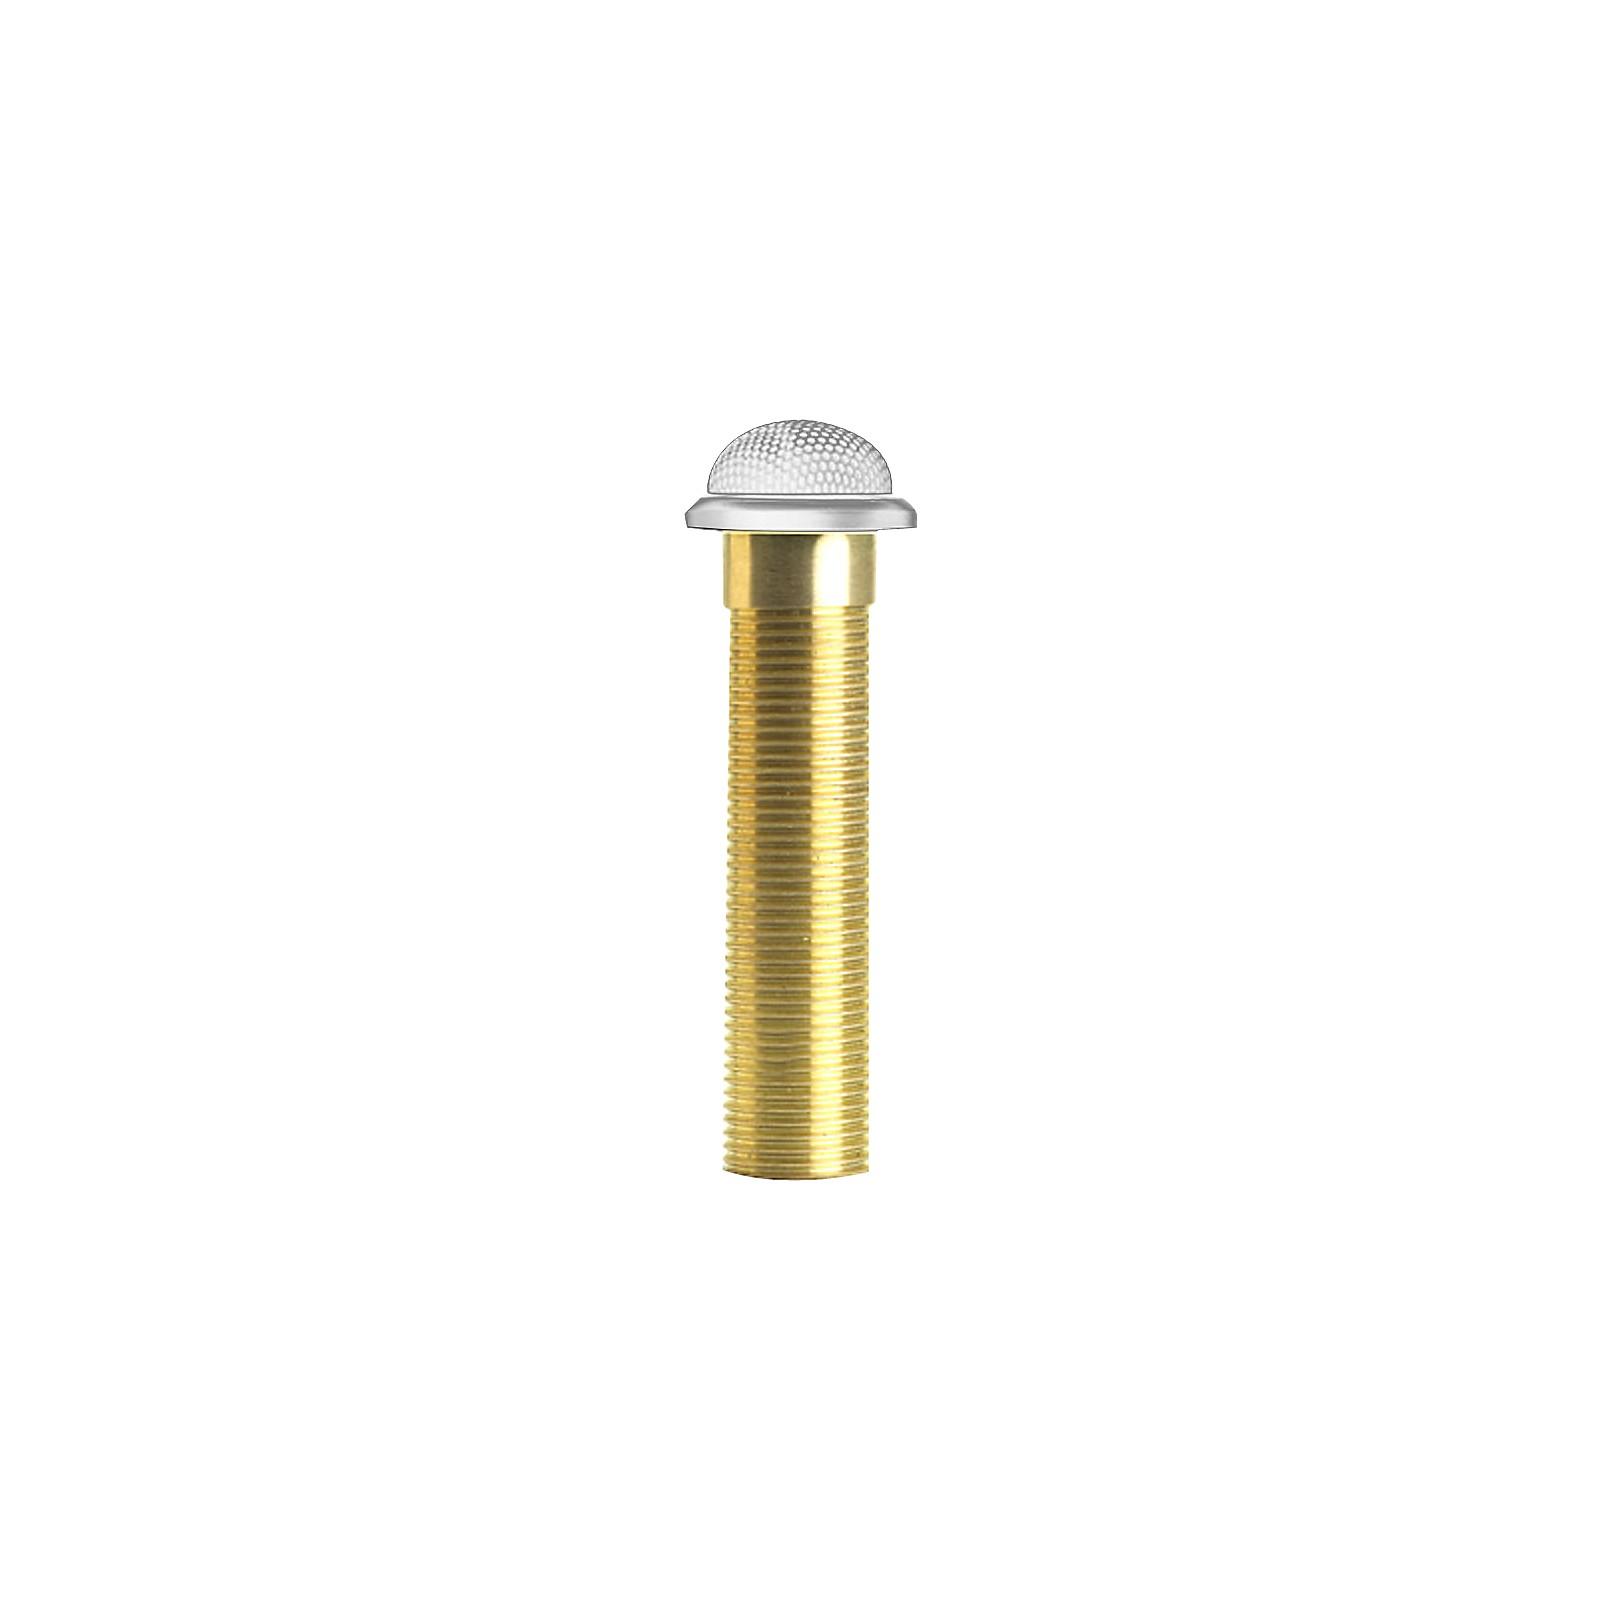 Open Box Shure MX395AL Microflex Low Profile Boundary Microphone